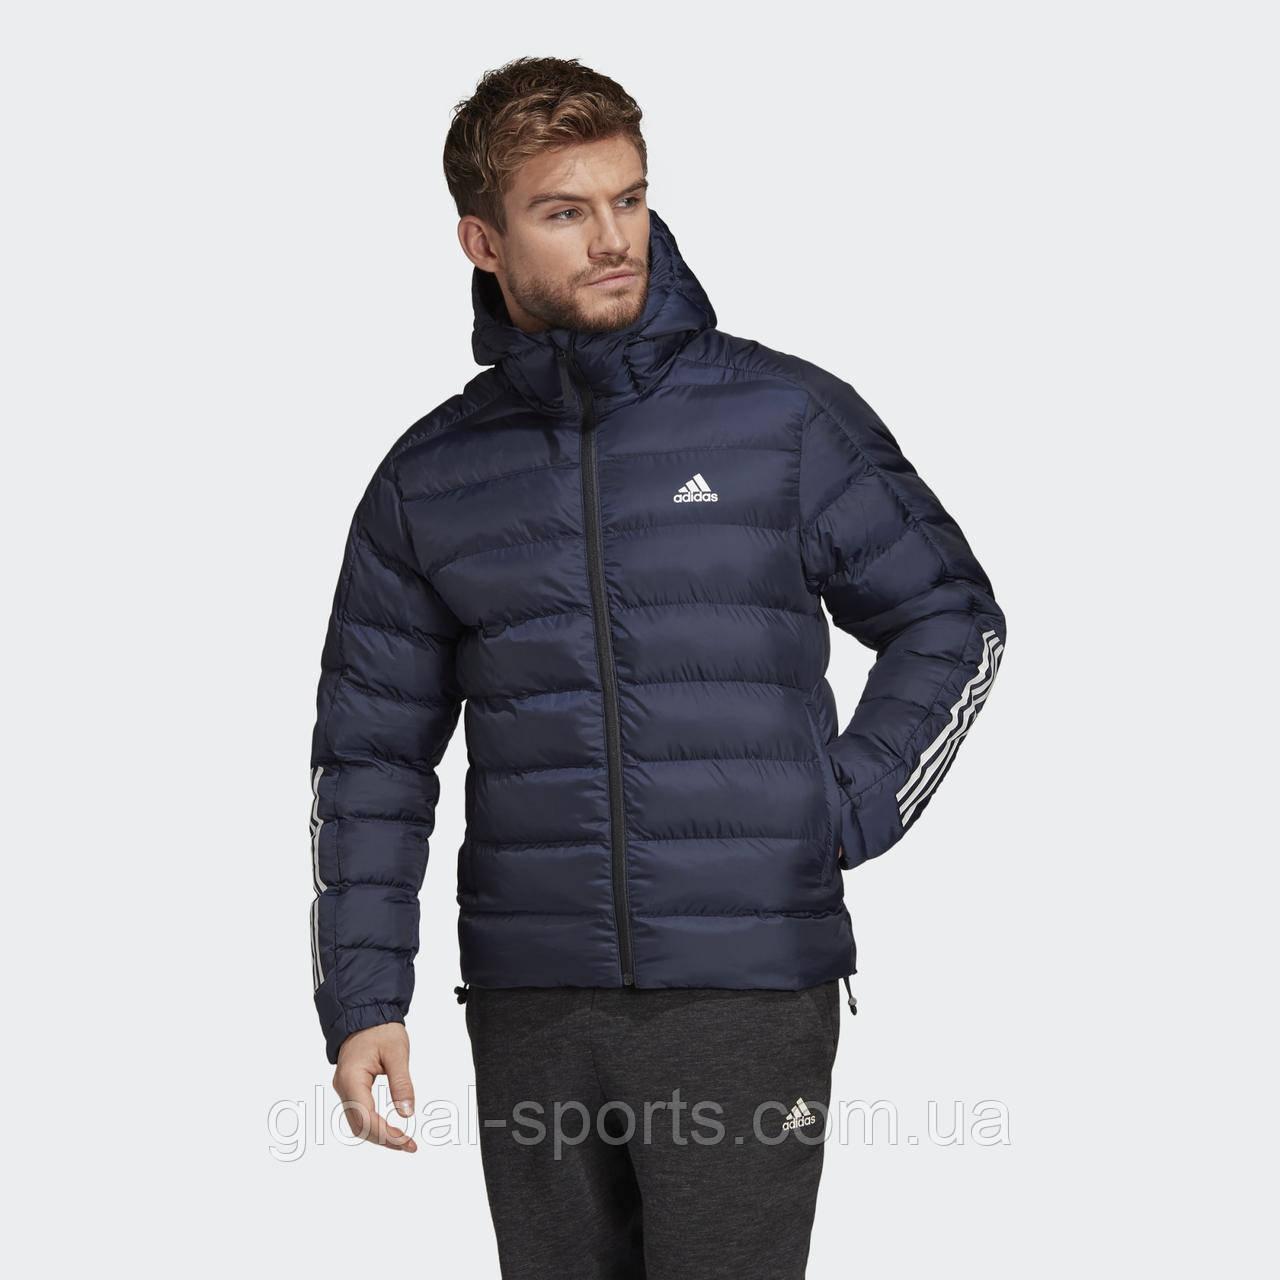 Мужская зимняя куртка Adidas Itavic 3-Stripes 2.0 (Артикул:DZ1412)